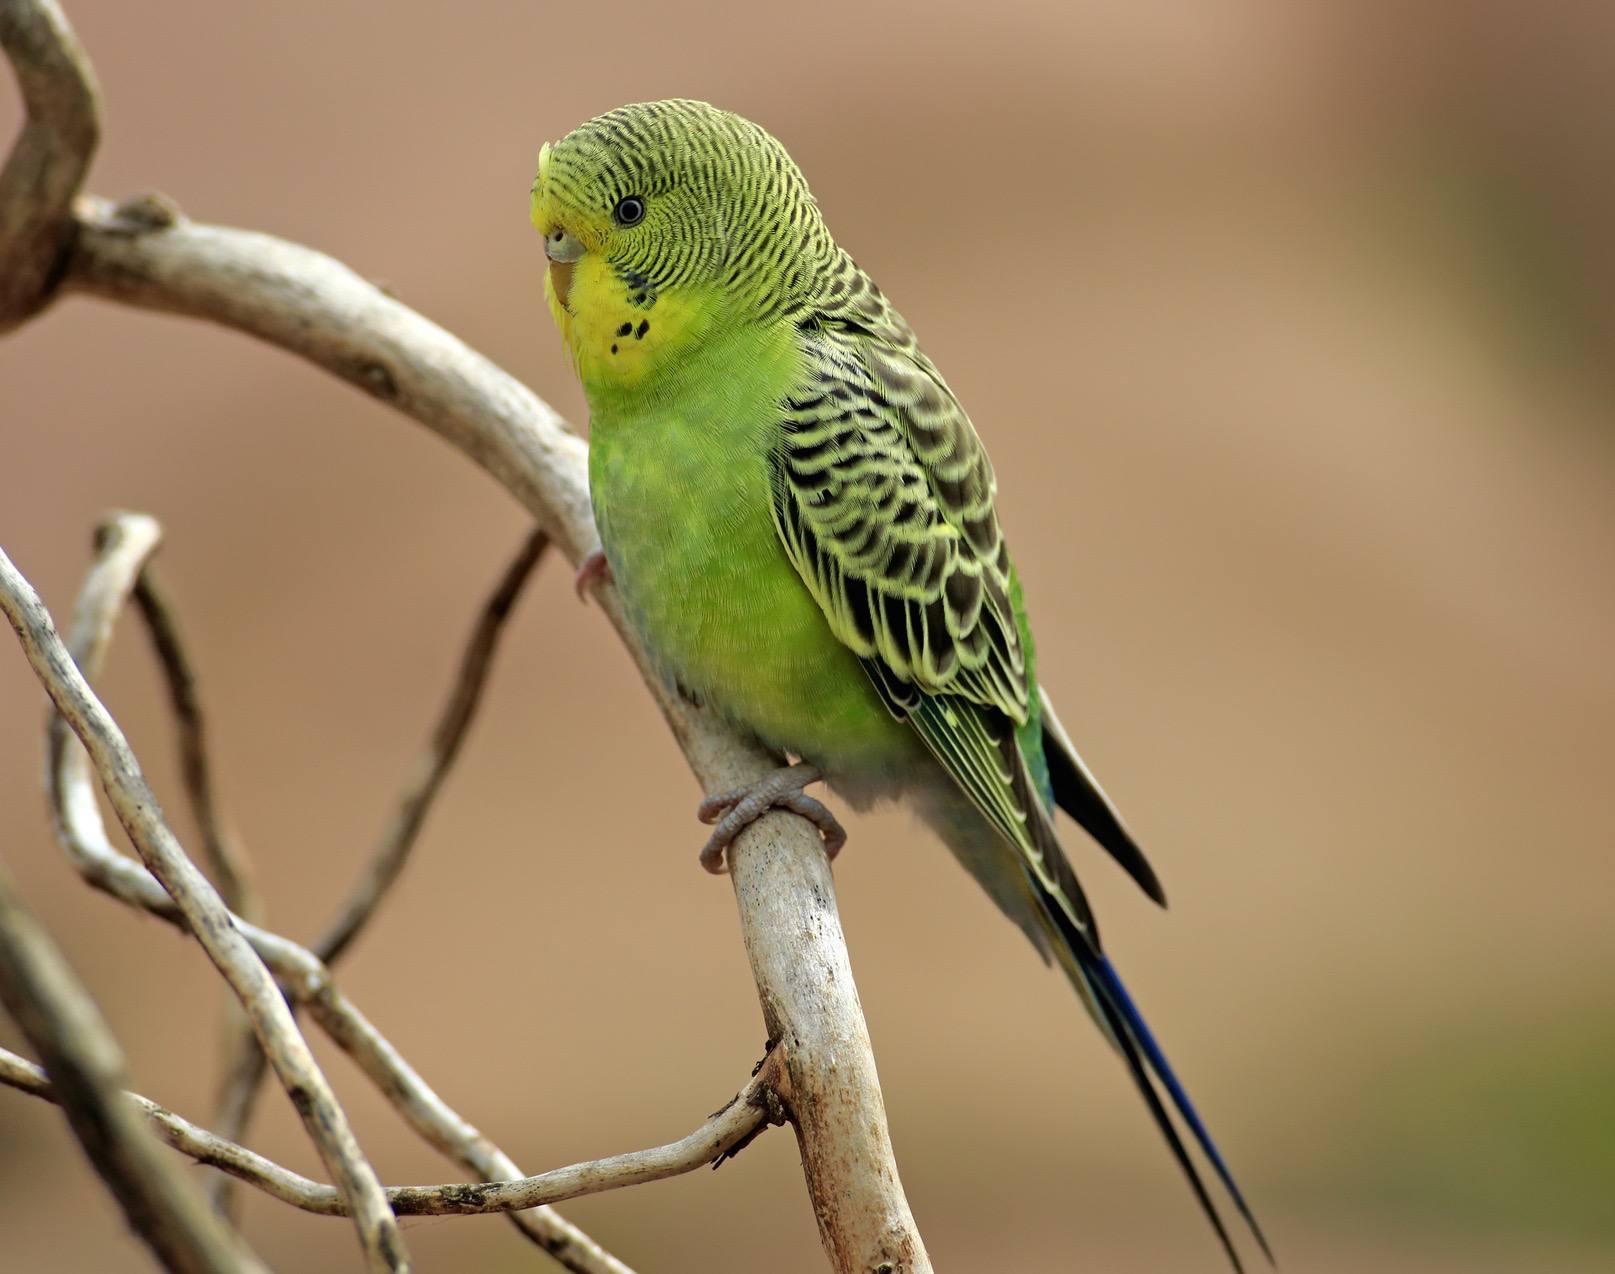 Green budgerigar sitting on a branch